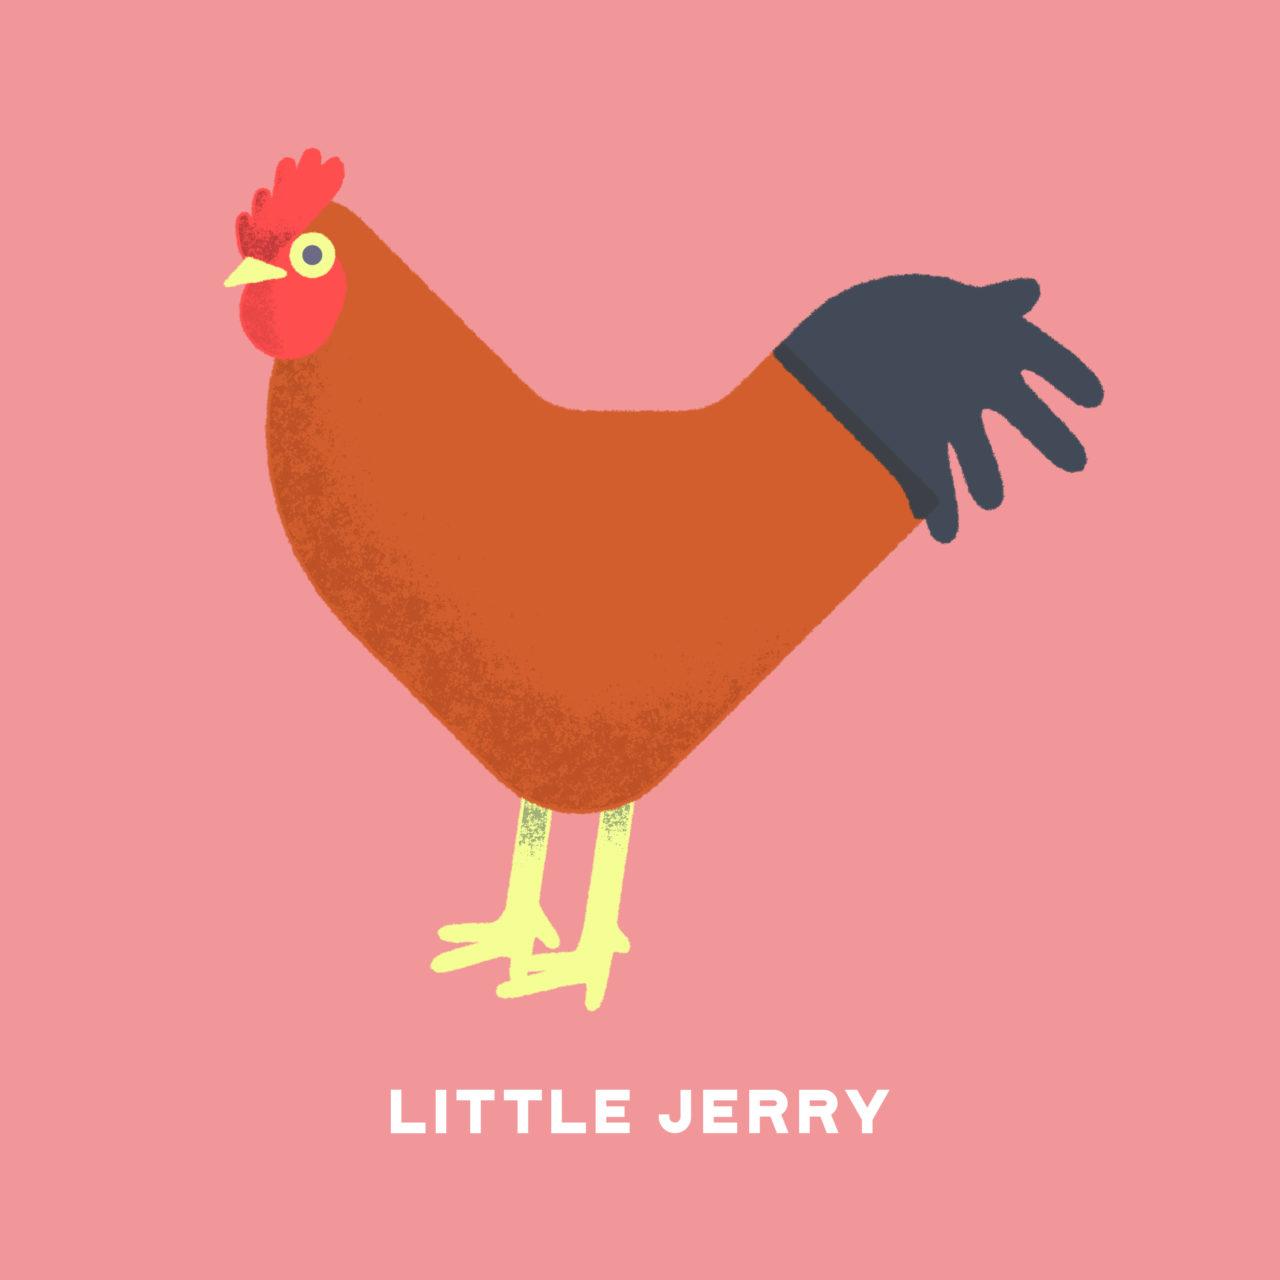 LittleJerry_V5_PRINT10